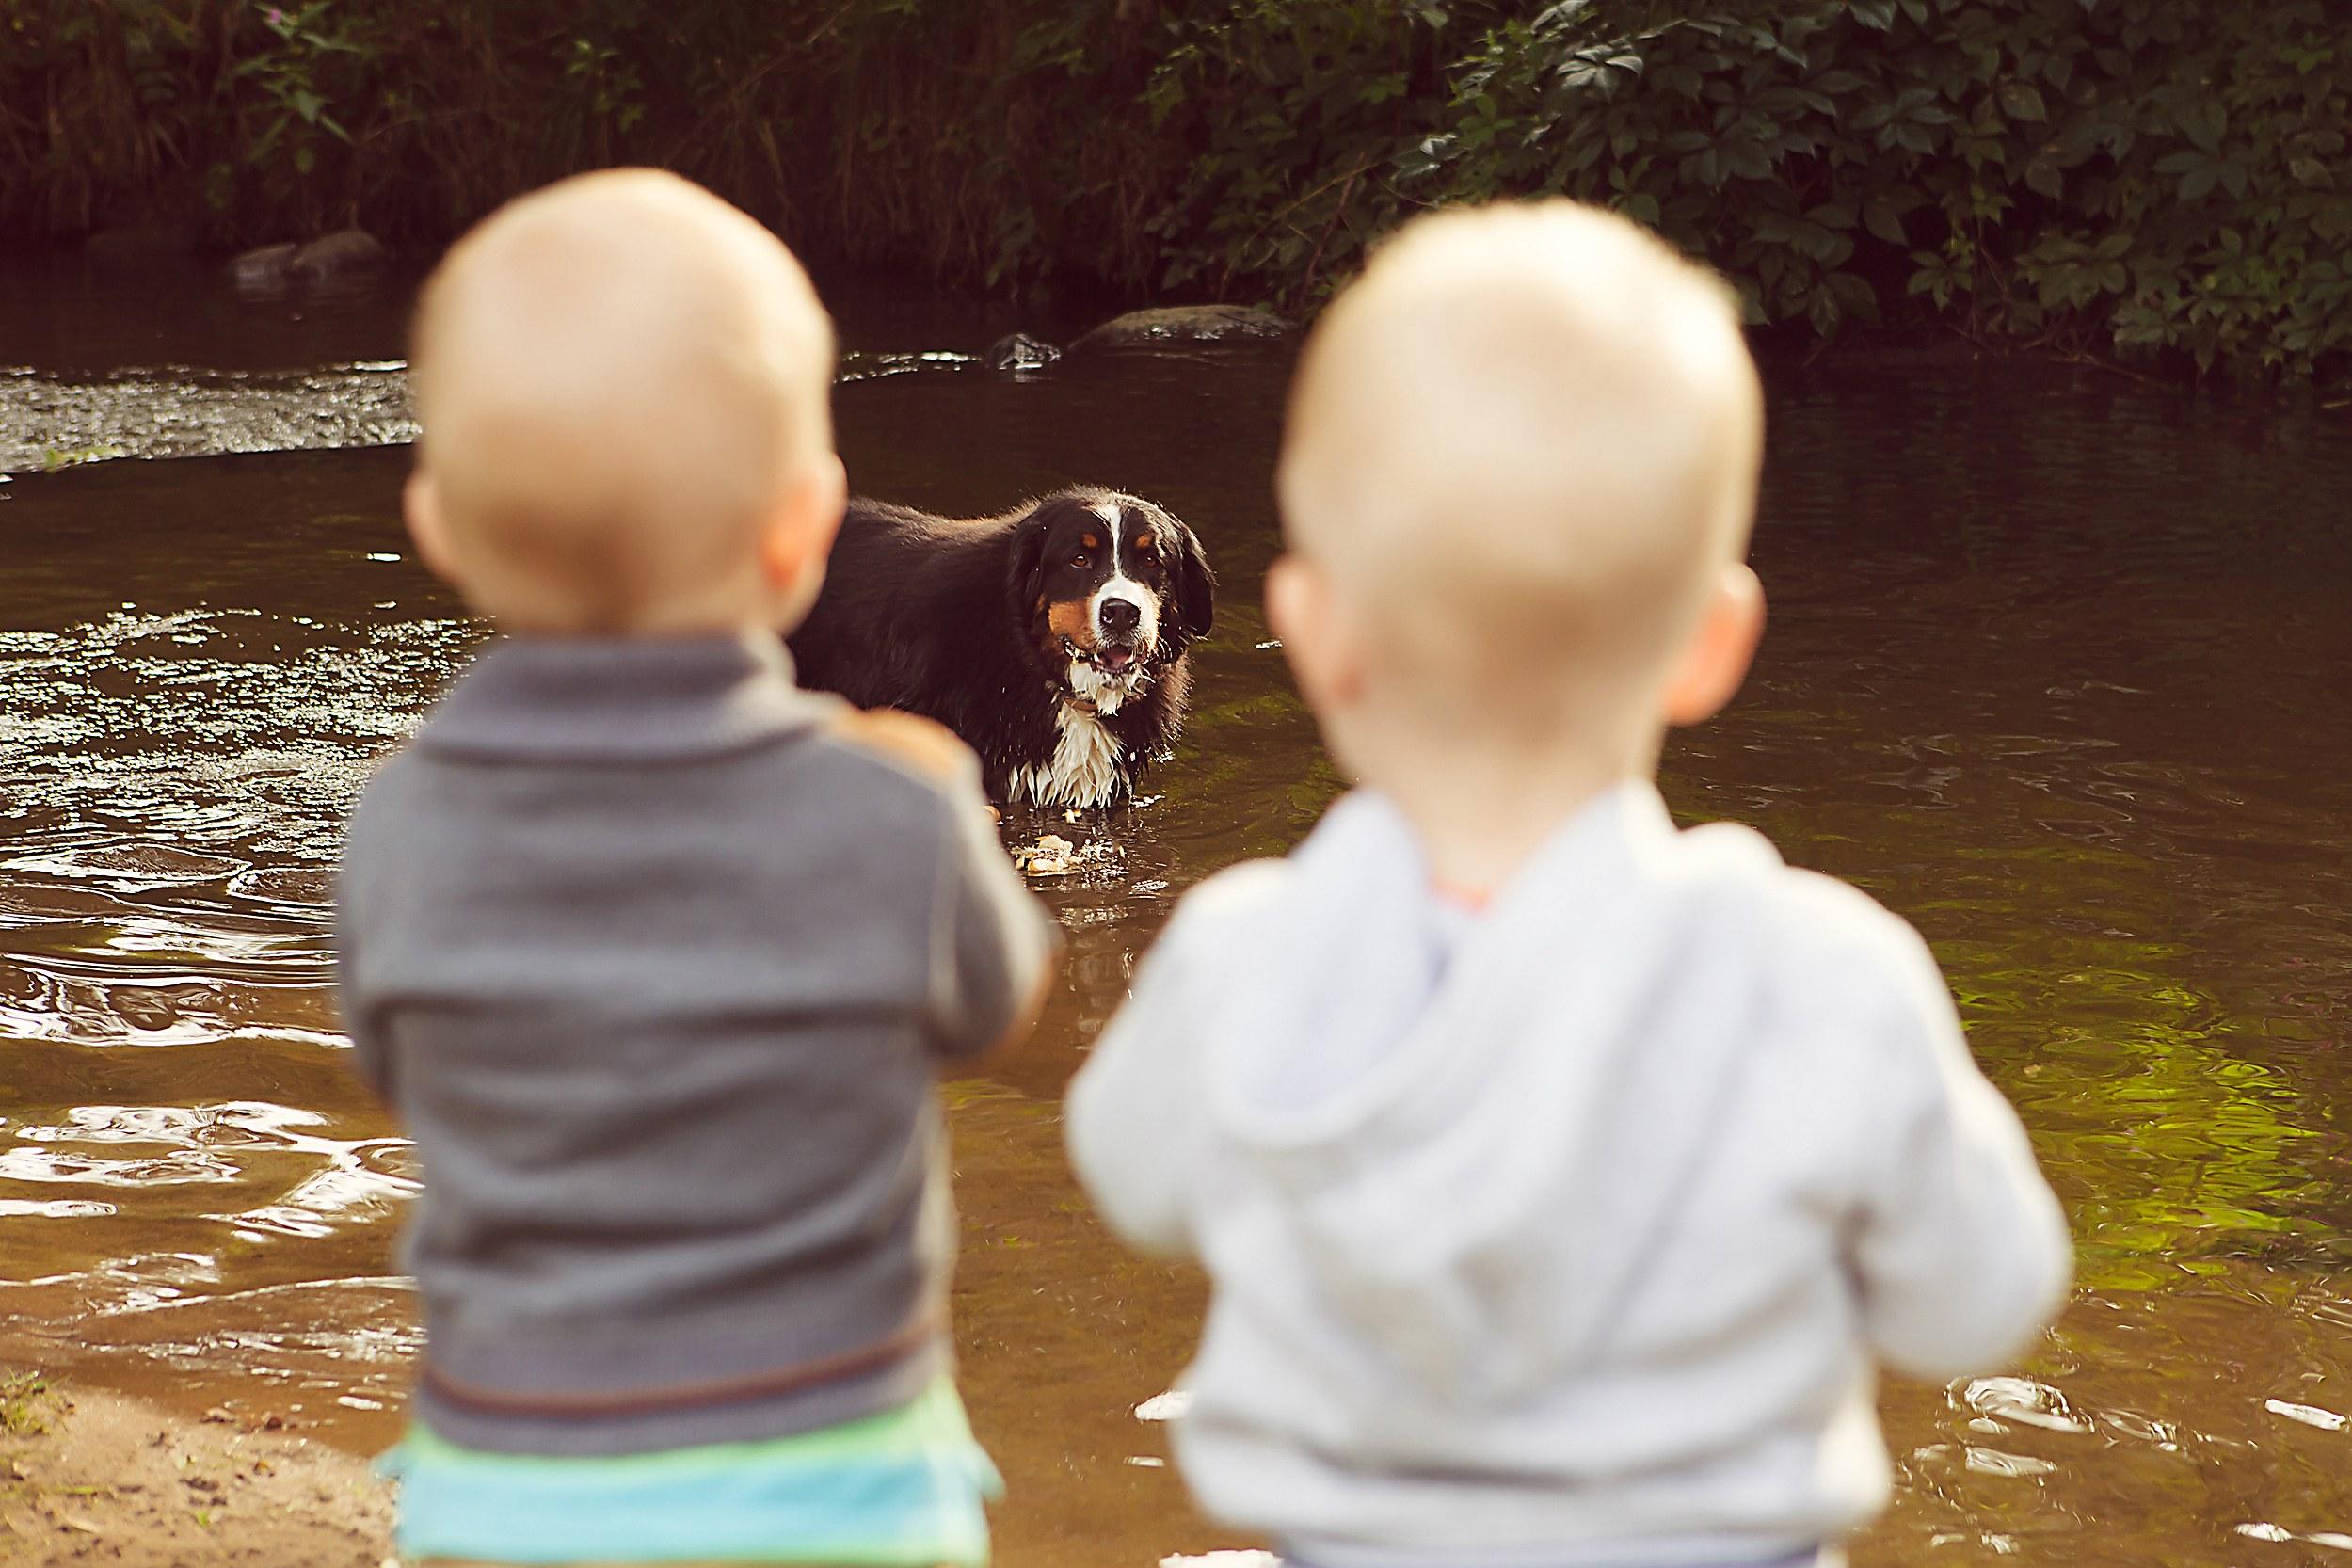 Kid's Afraid of Dogs